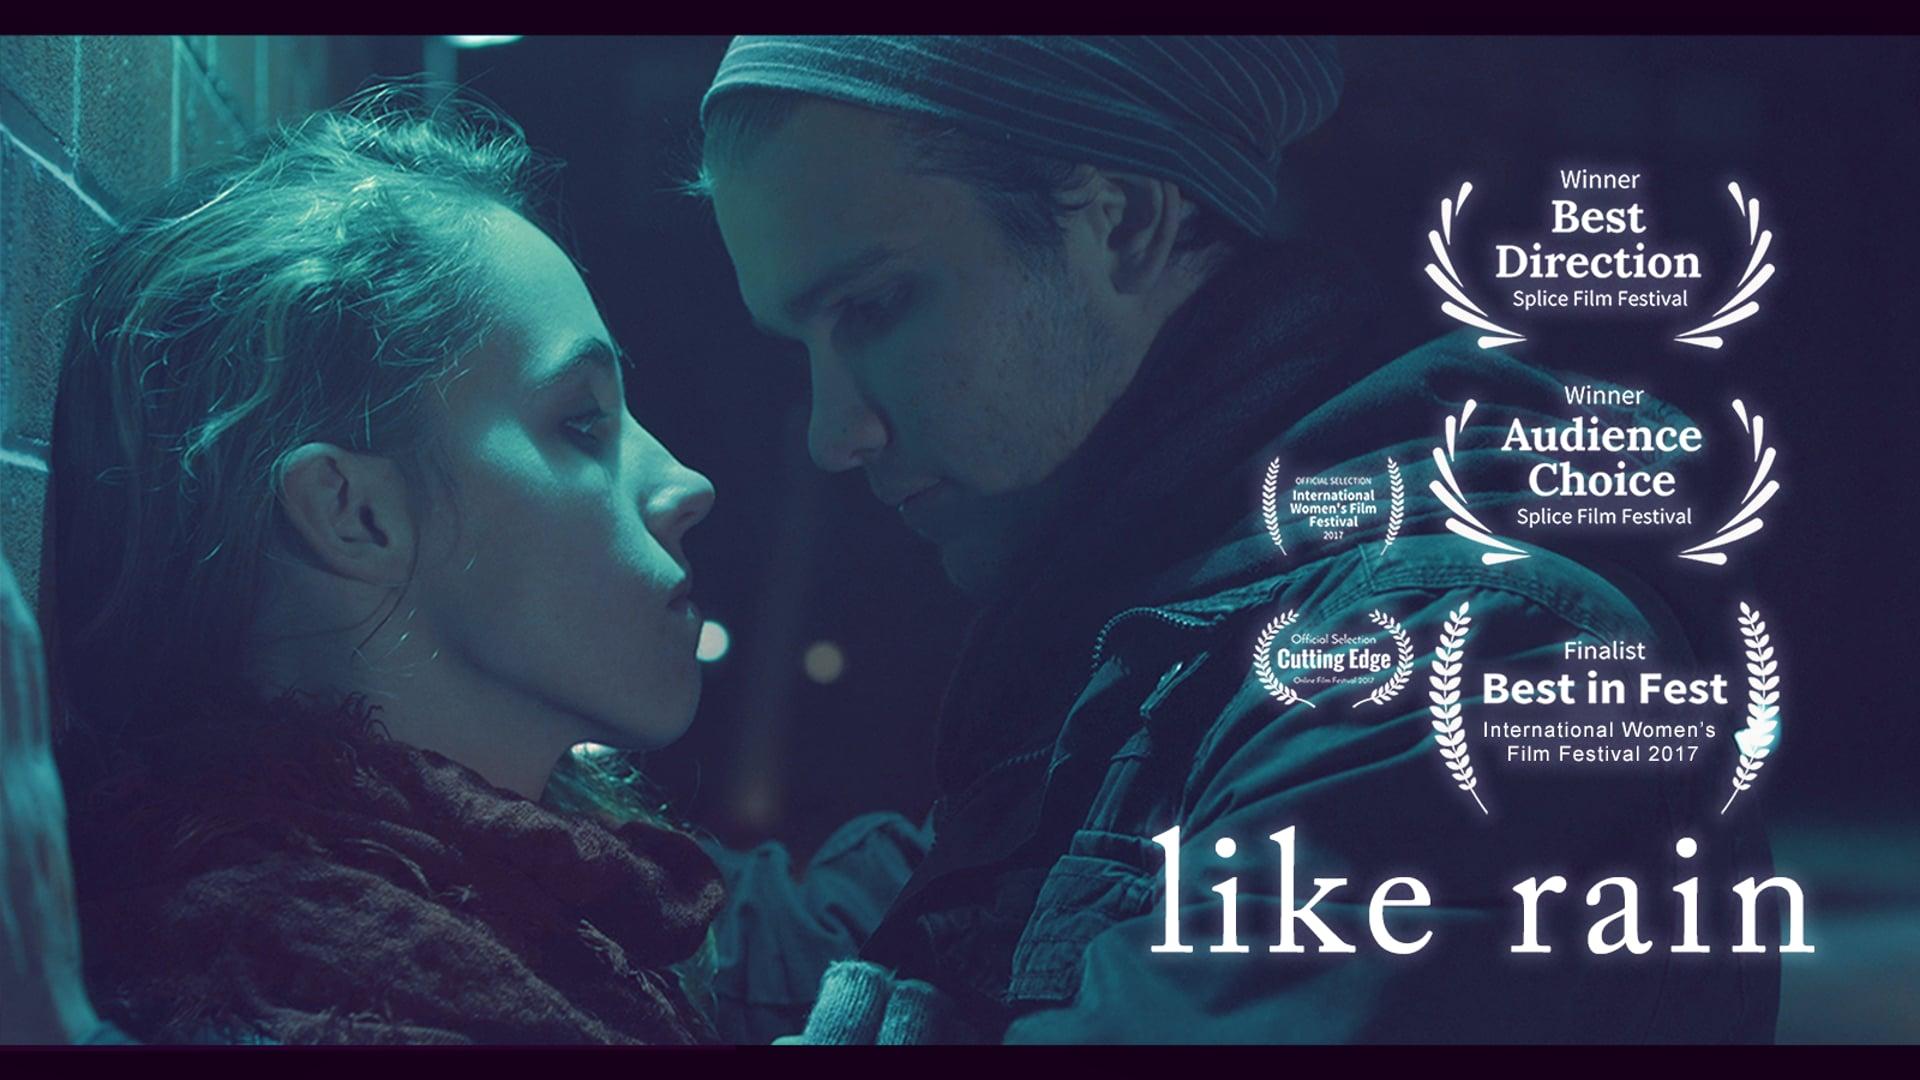 LIKE RAIN - a film about rape, mental illness, & love